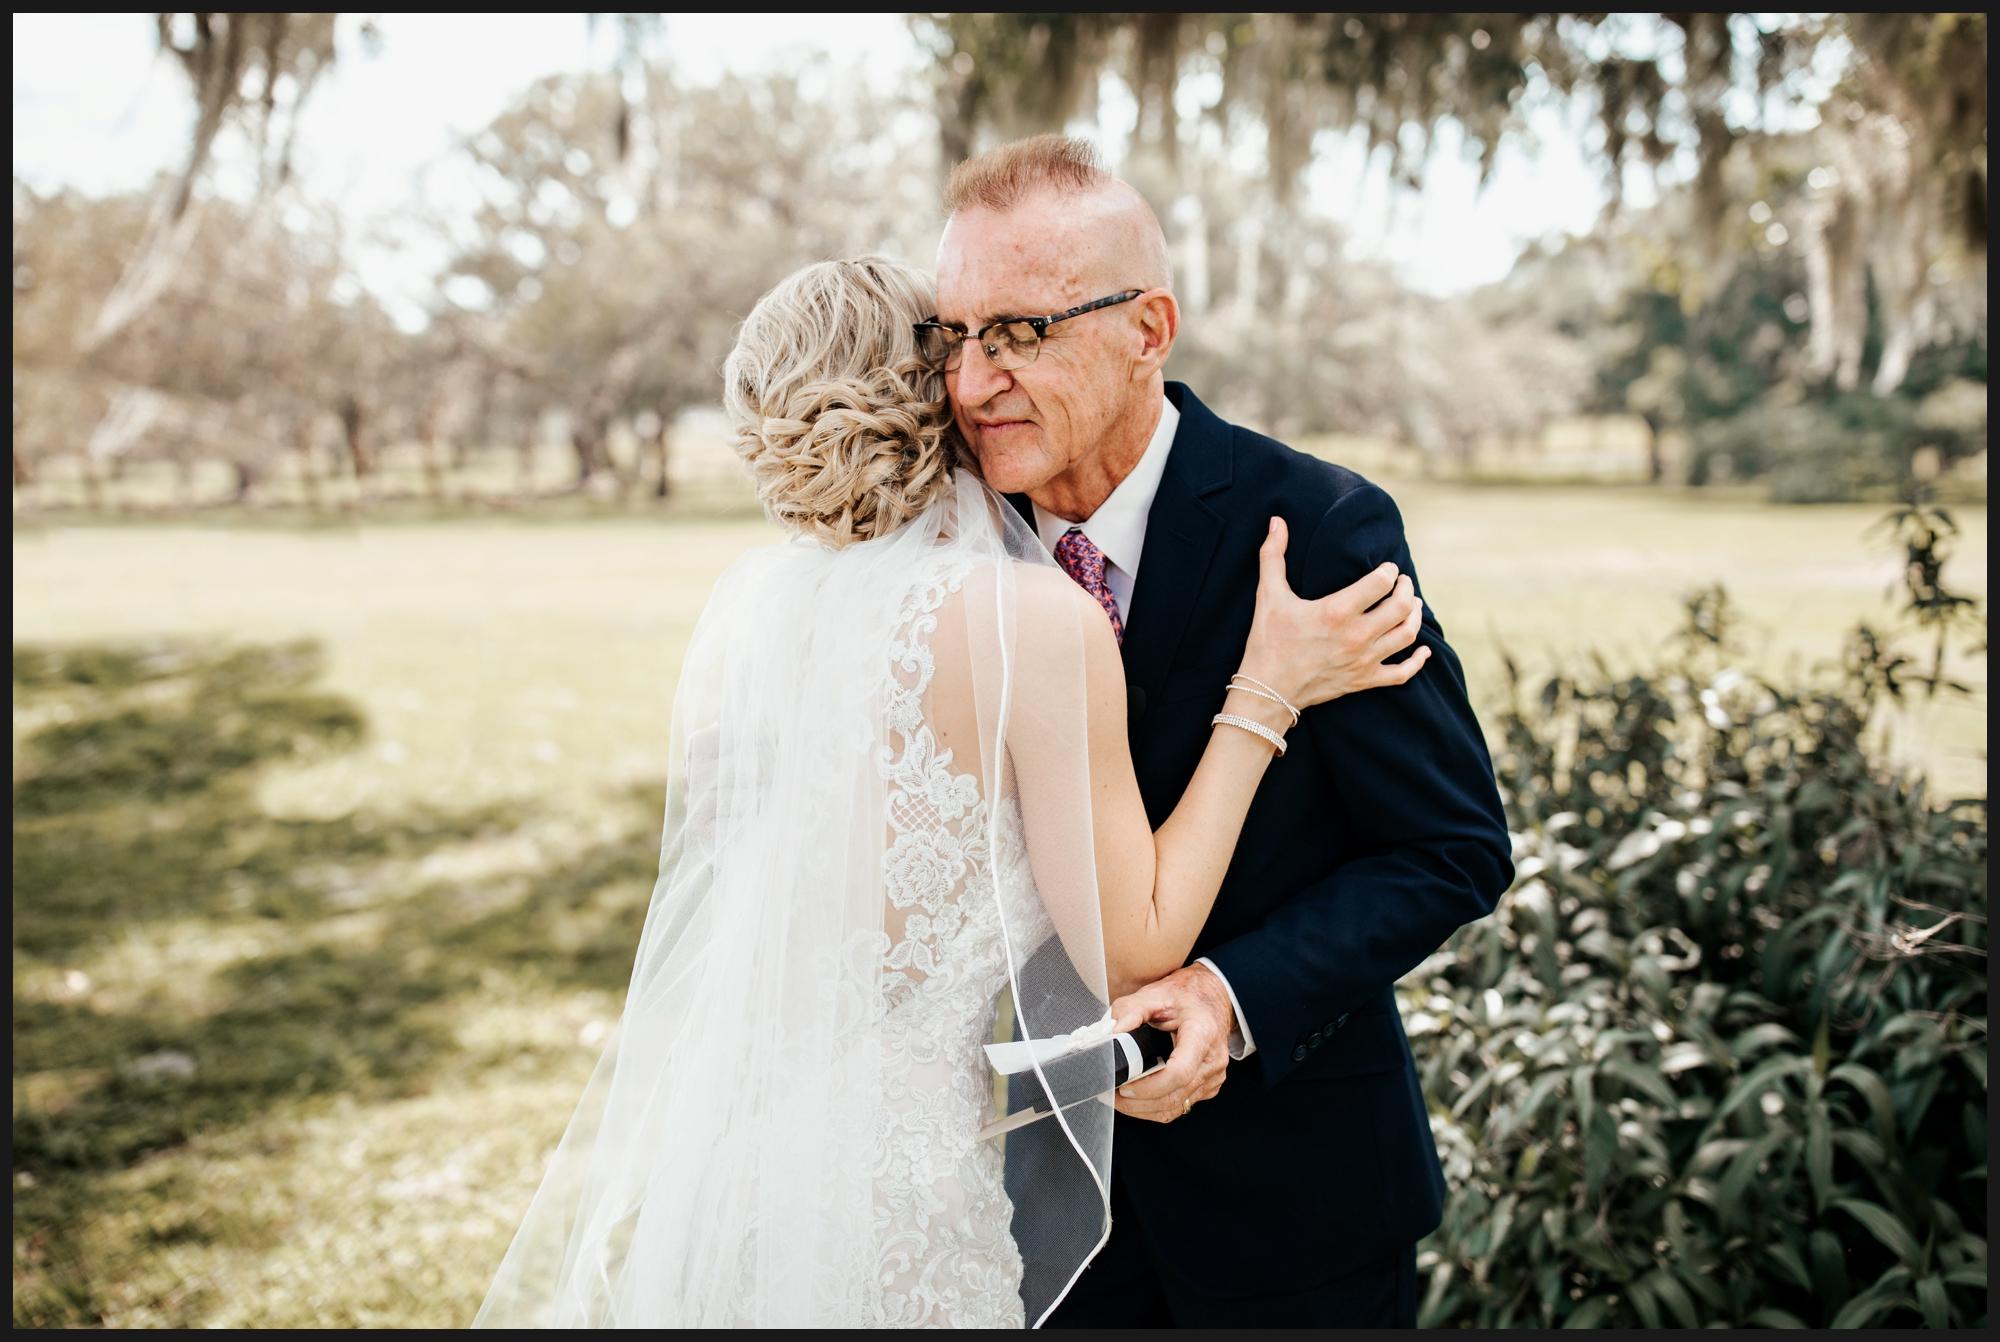 Orlando-Wedding-Photographer-destination-wedding-photographer-florida-wedding-photographer-hawaii-wedding-photographer_0590.jpg